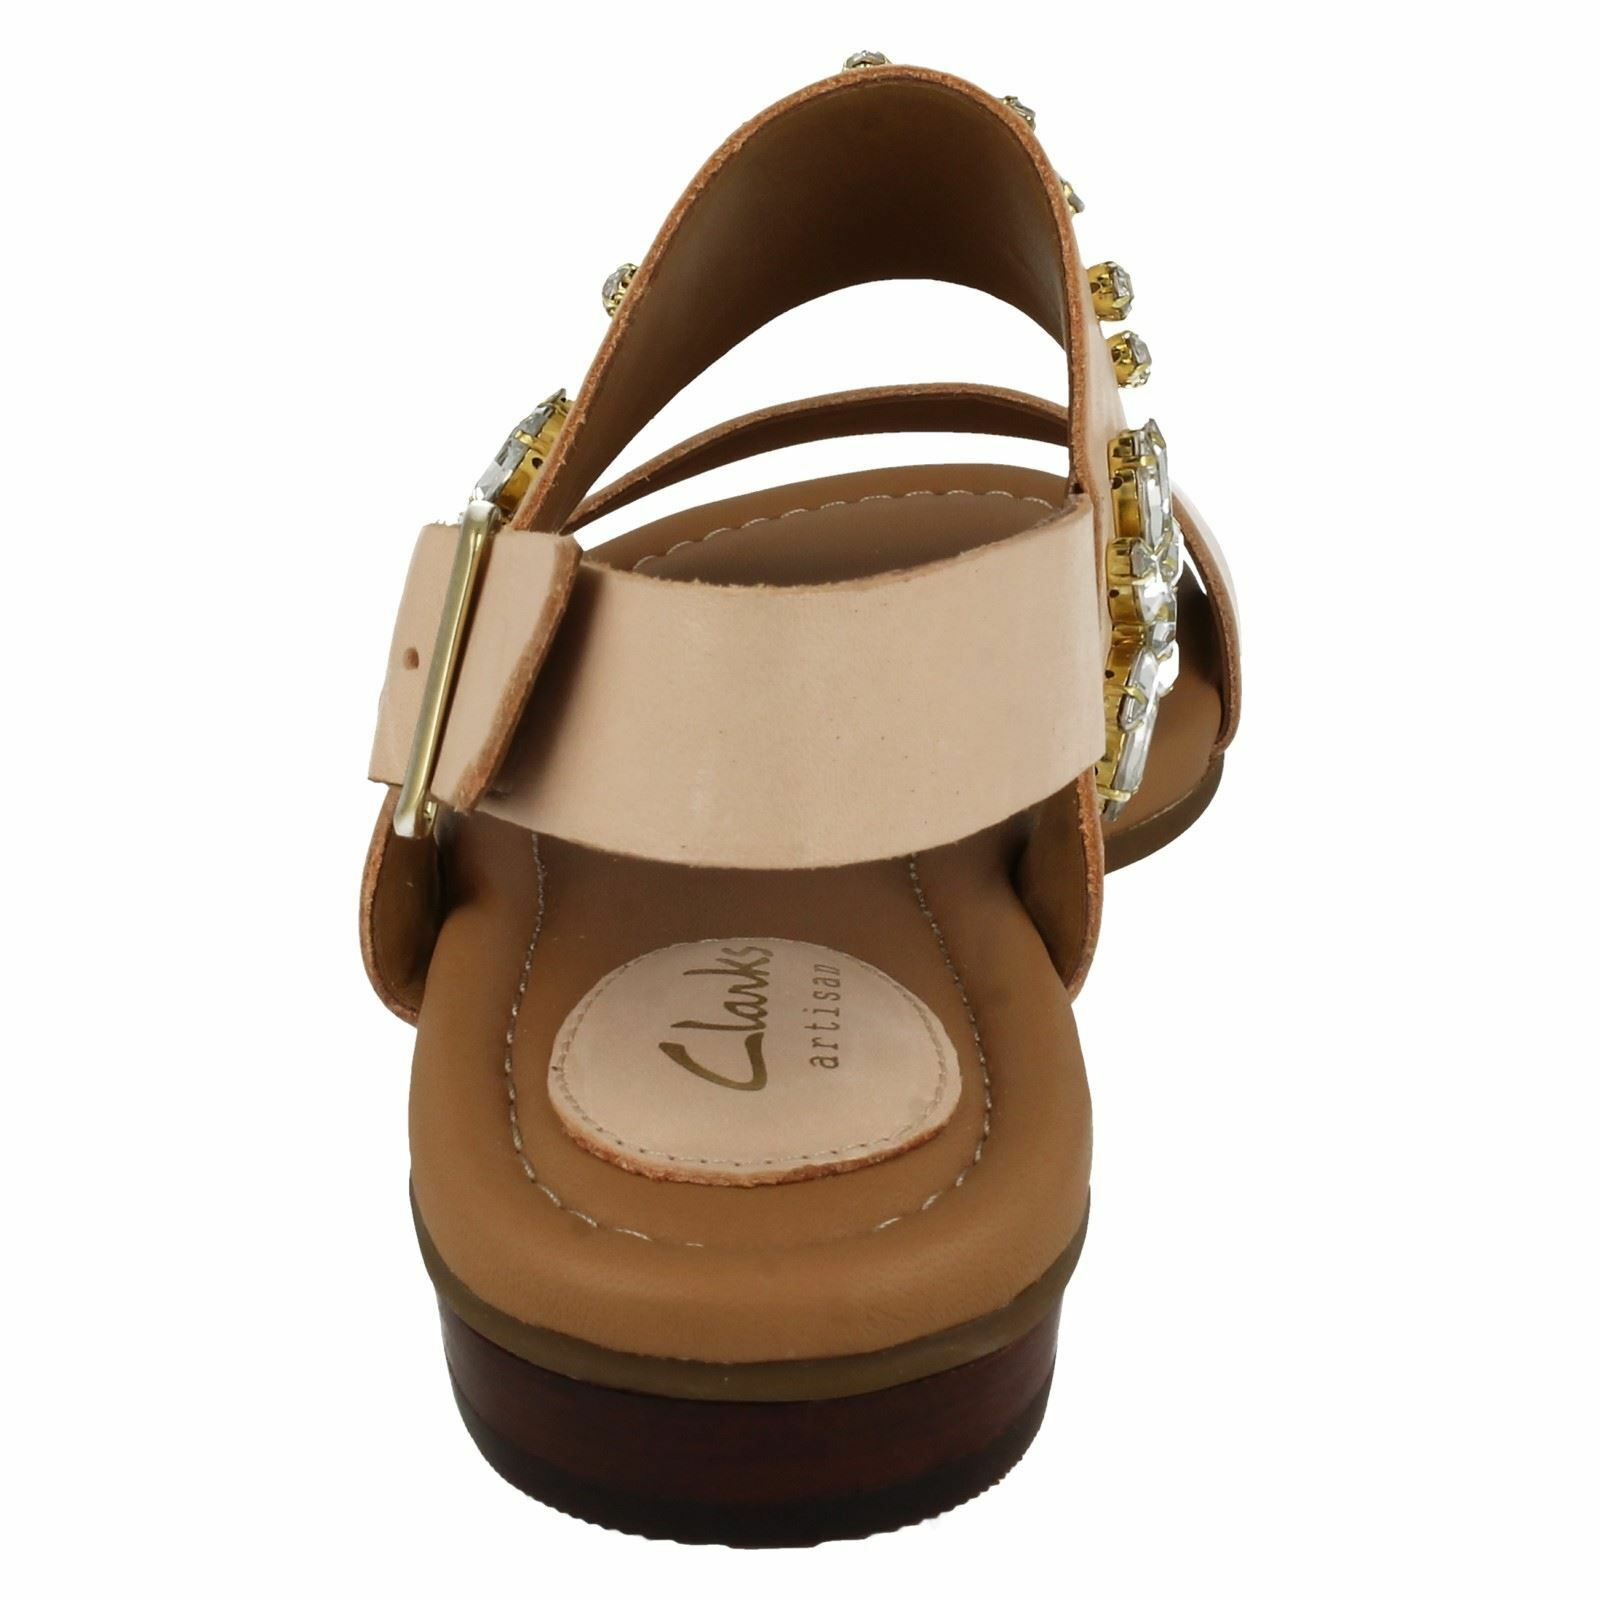 Clarks Viveca SIZE Melrose Damenschuhe Nude Ankle Strap Sandale SIZE Viveca UK4 EUR37 US6.5 9d5930